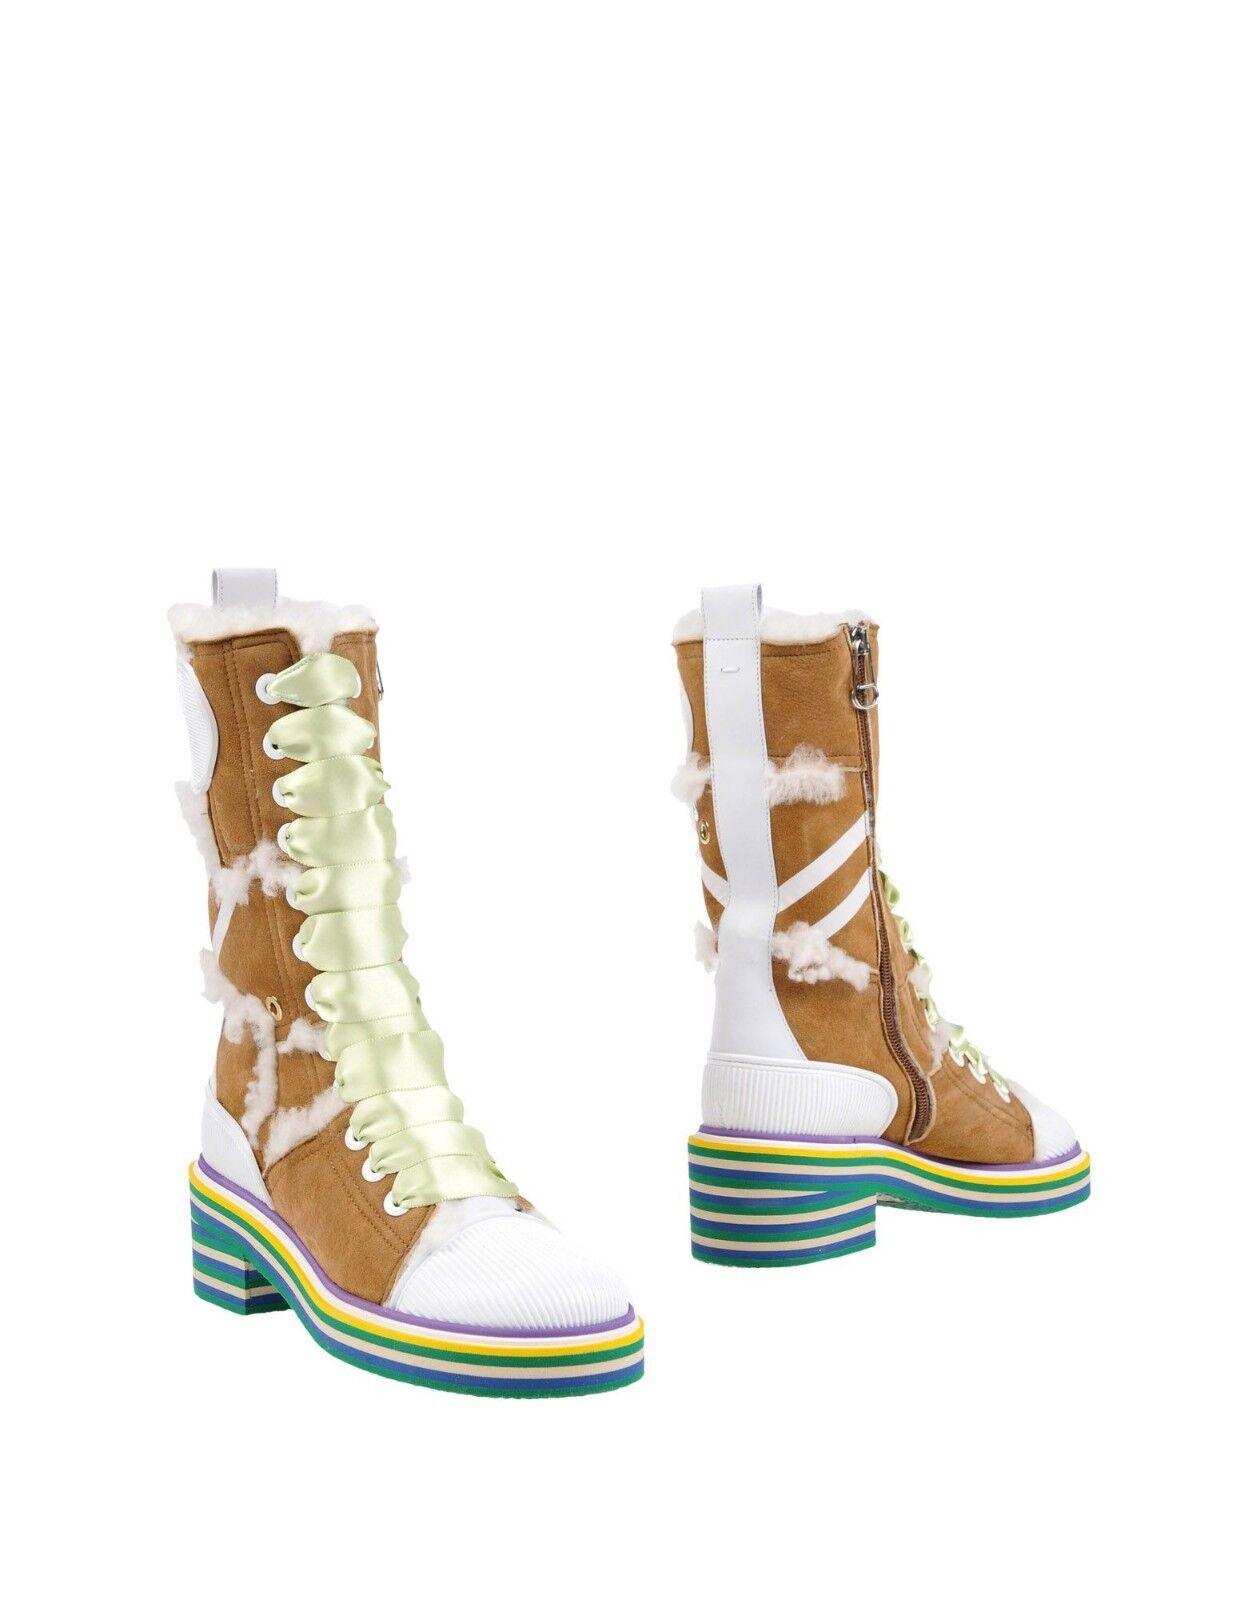 MAISON MARGIELA Ankle SHEARLING Stiefel  1150 Größe US7 NWB